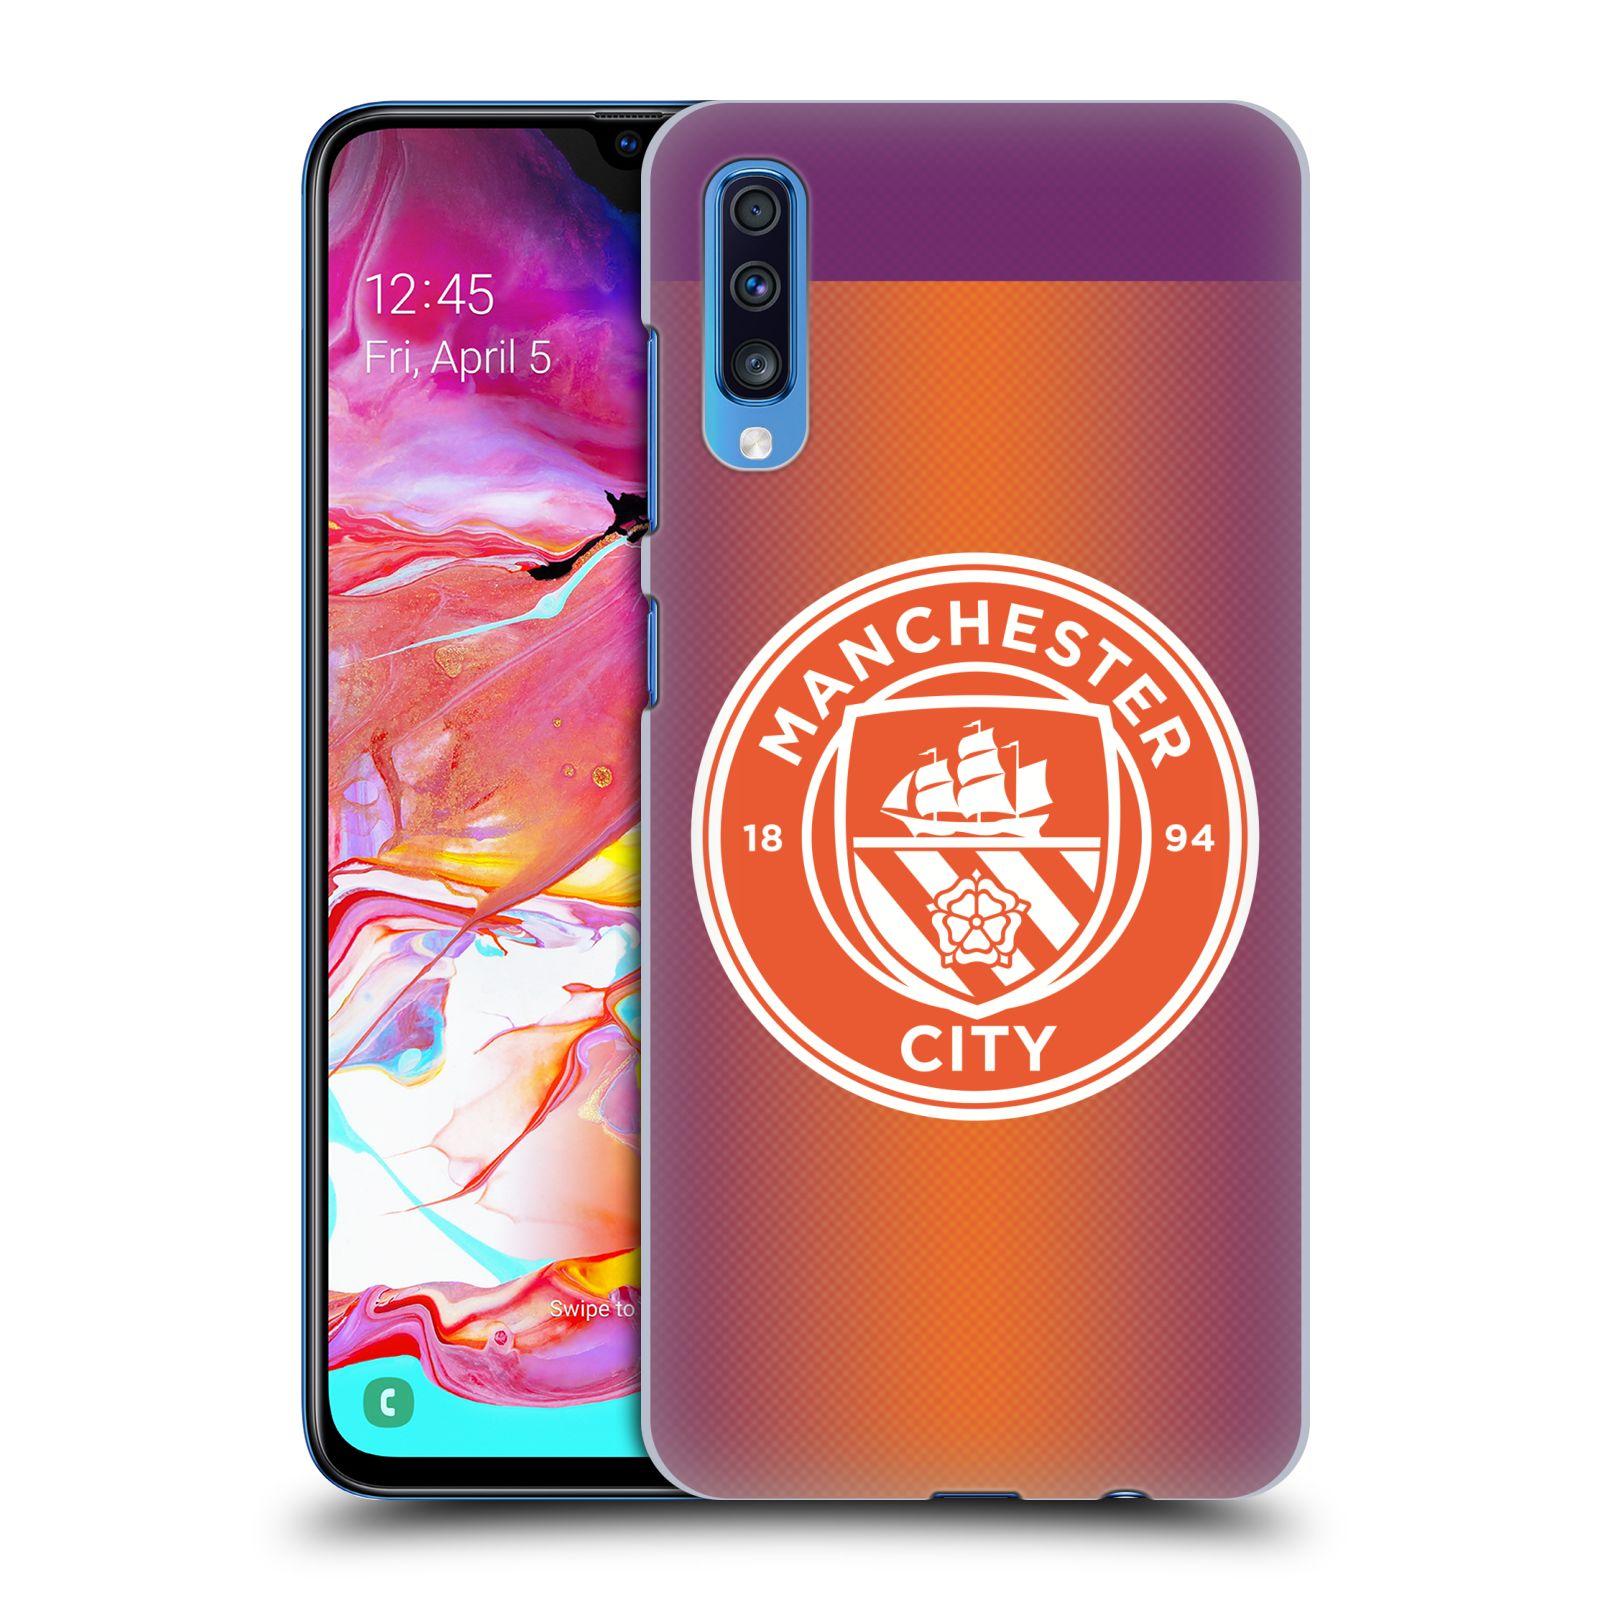 Plastové pouzdro na mobil Samsung Galaxy A70 - Head Case - Manchester City FC - Oranžové nové logo